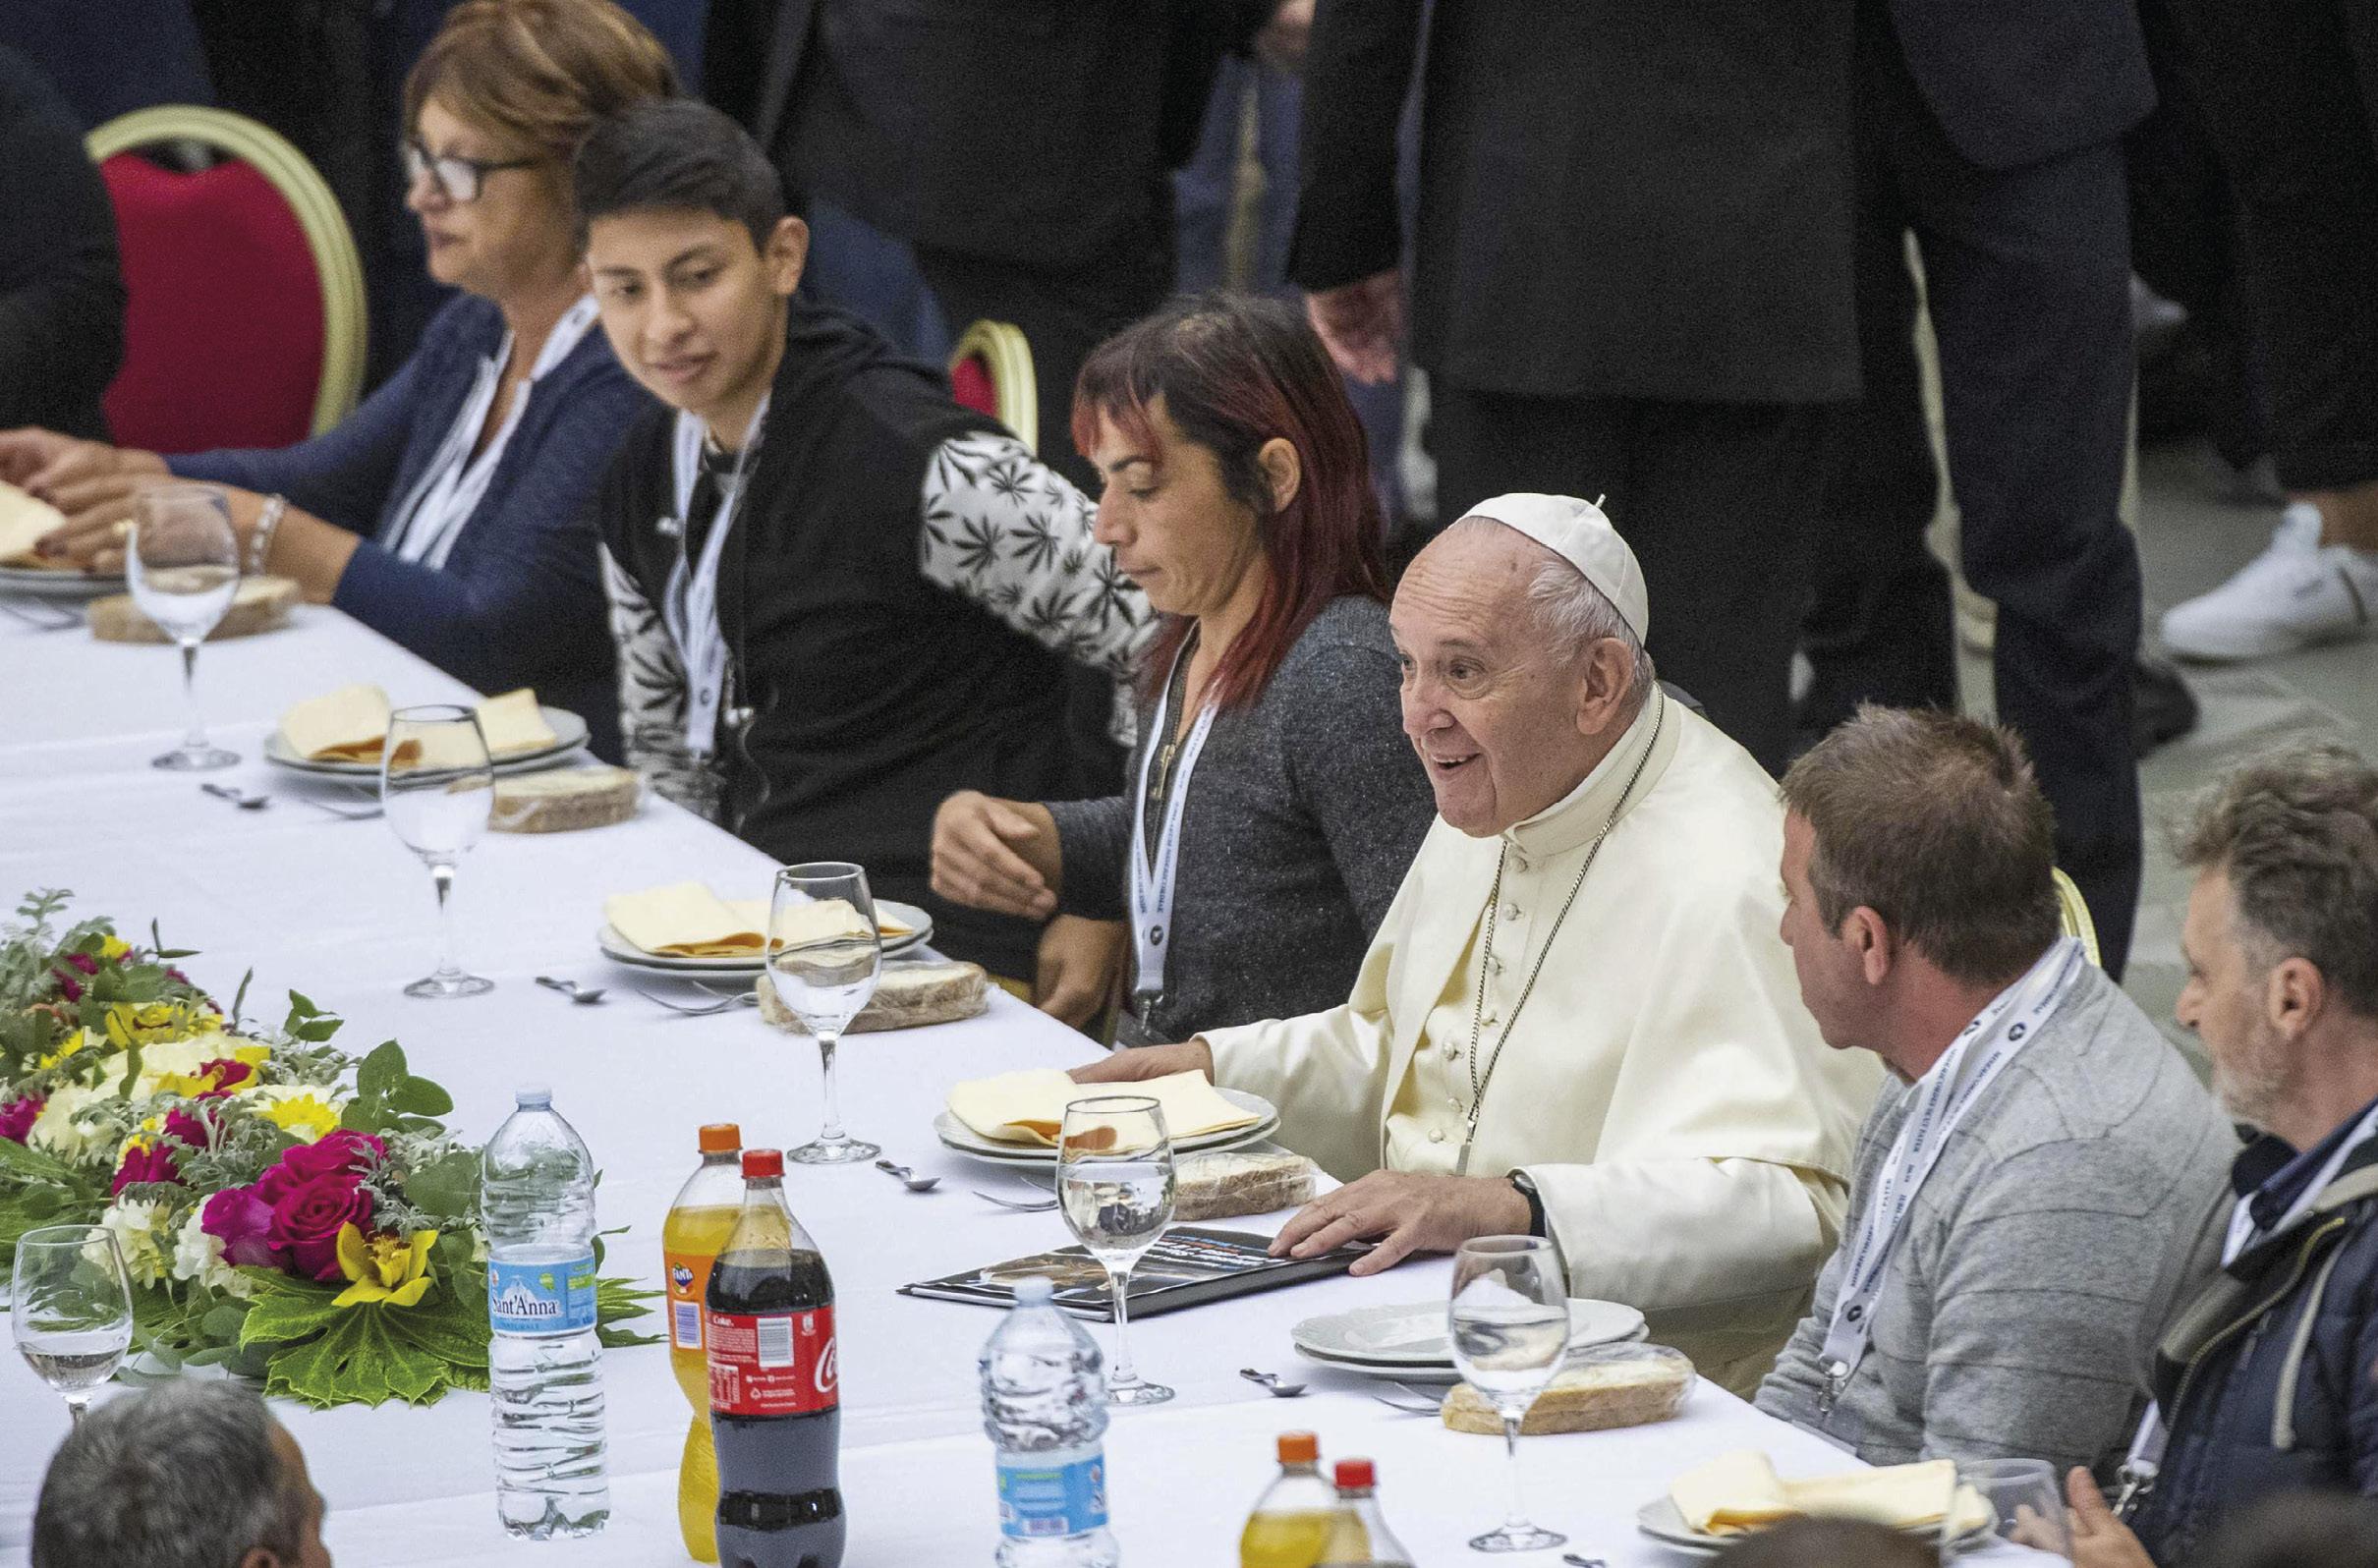 O Papa Francisco almoça com os pobres no Vaticano, 17 de novembro de 2019. EPA / Claudio Peri.